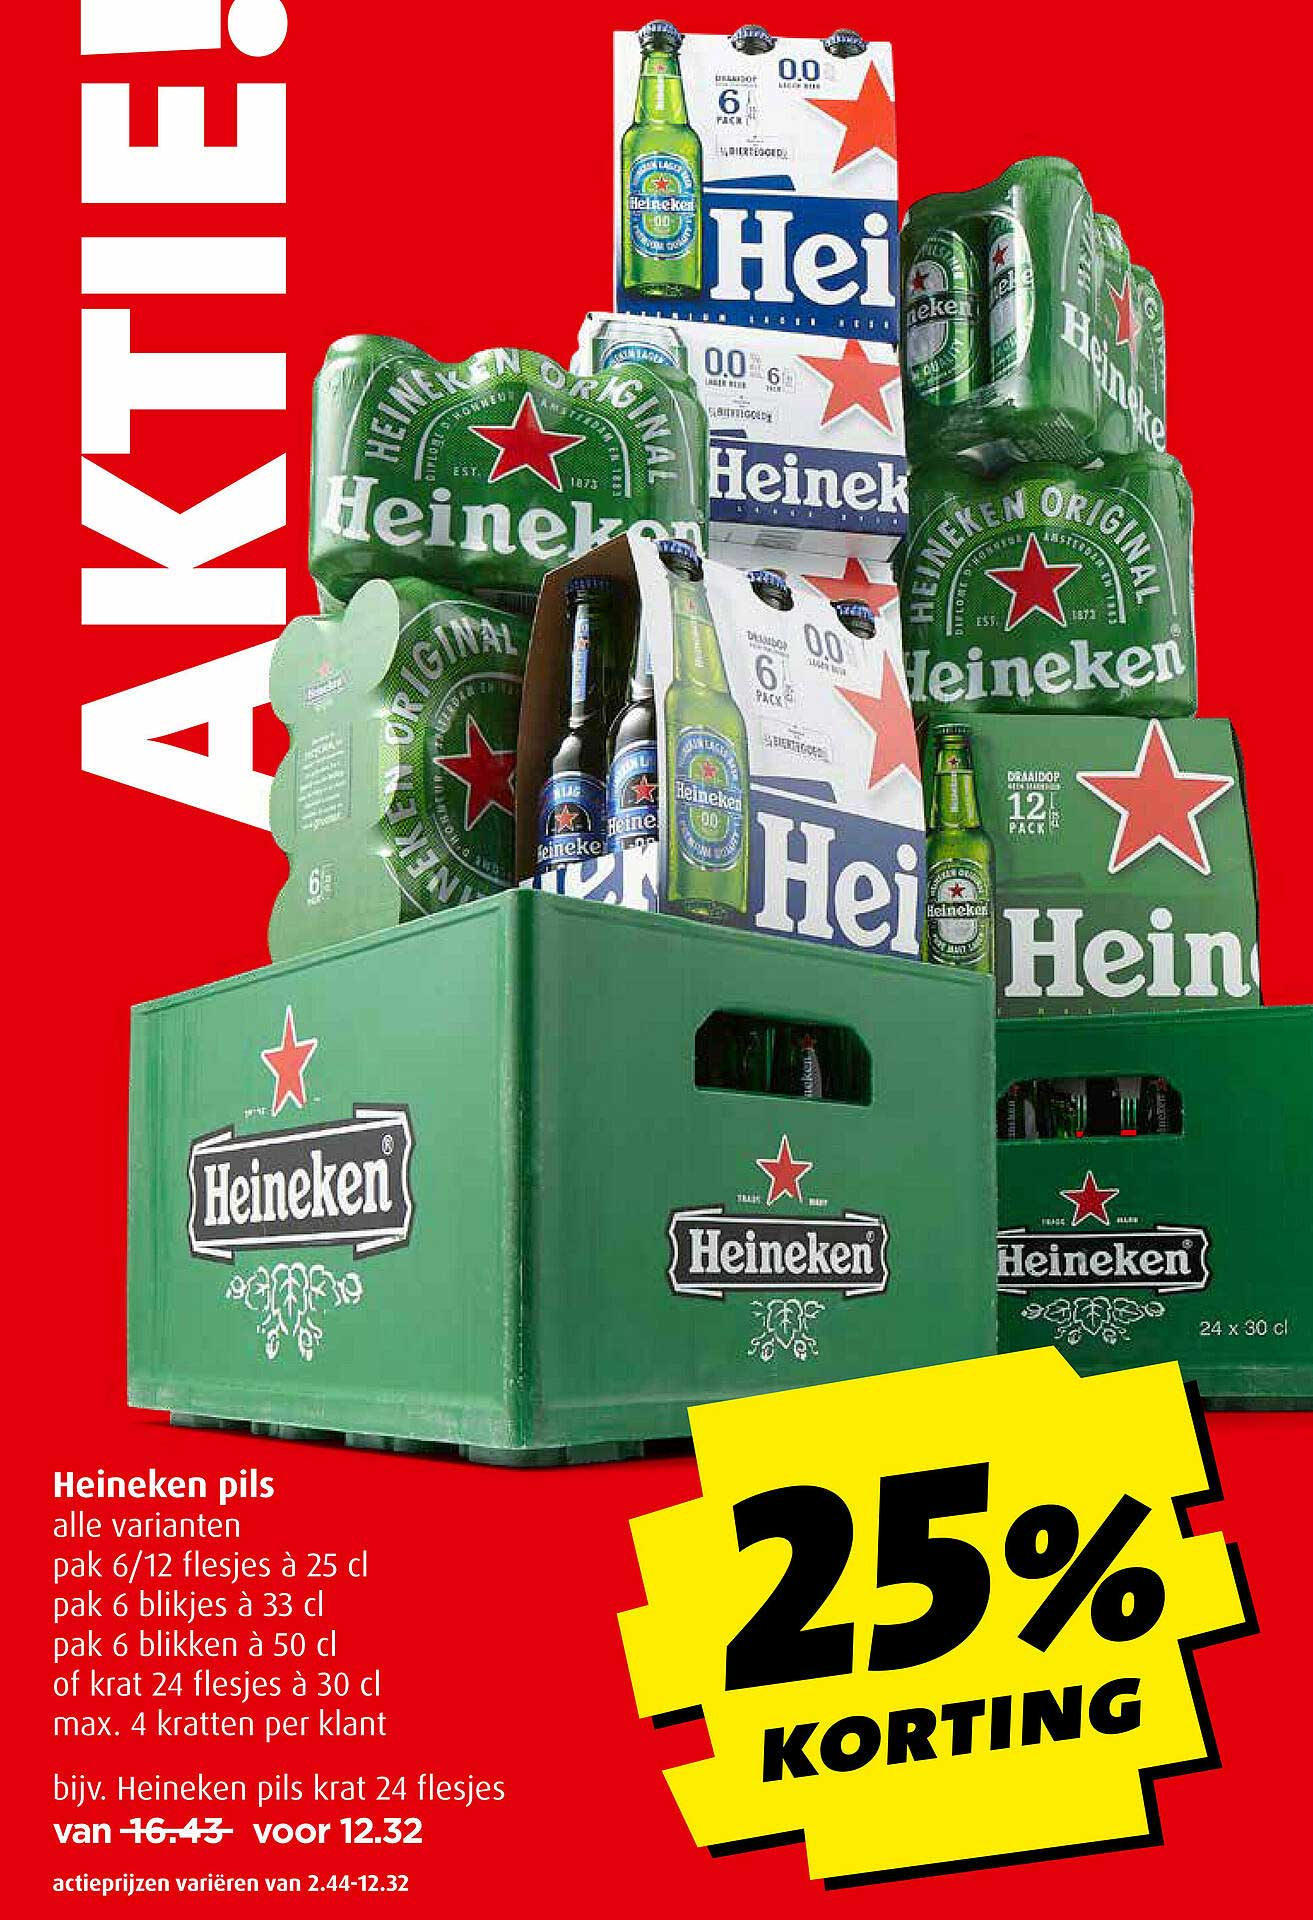 Boni Heineken Pils 25% Korting